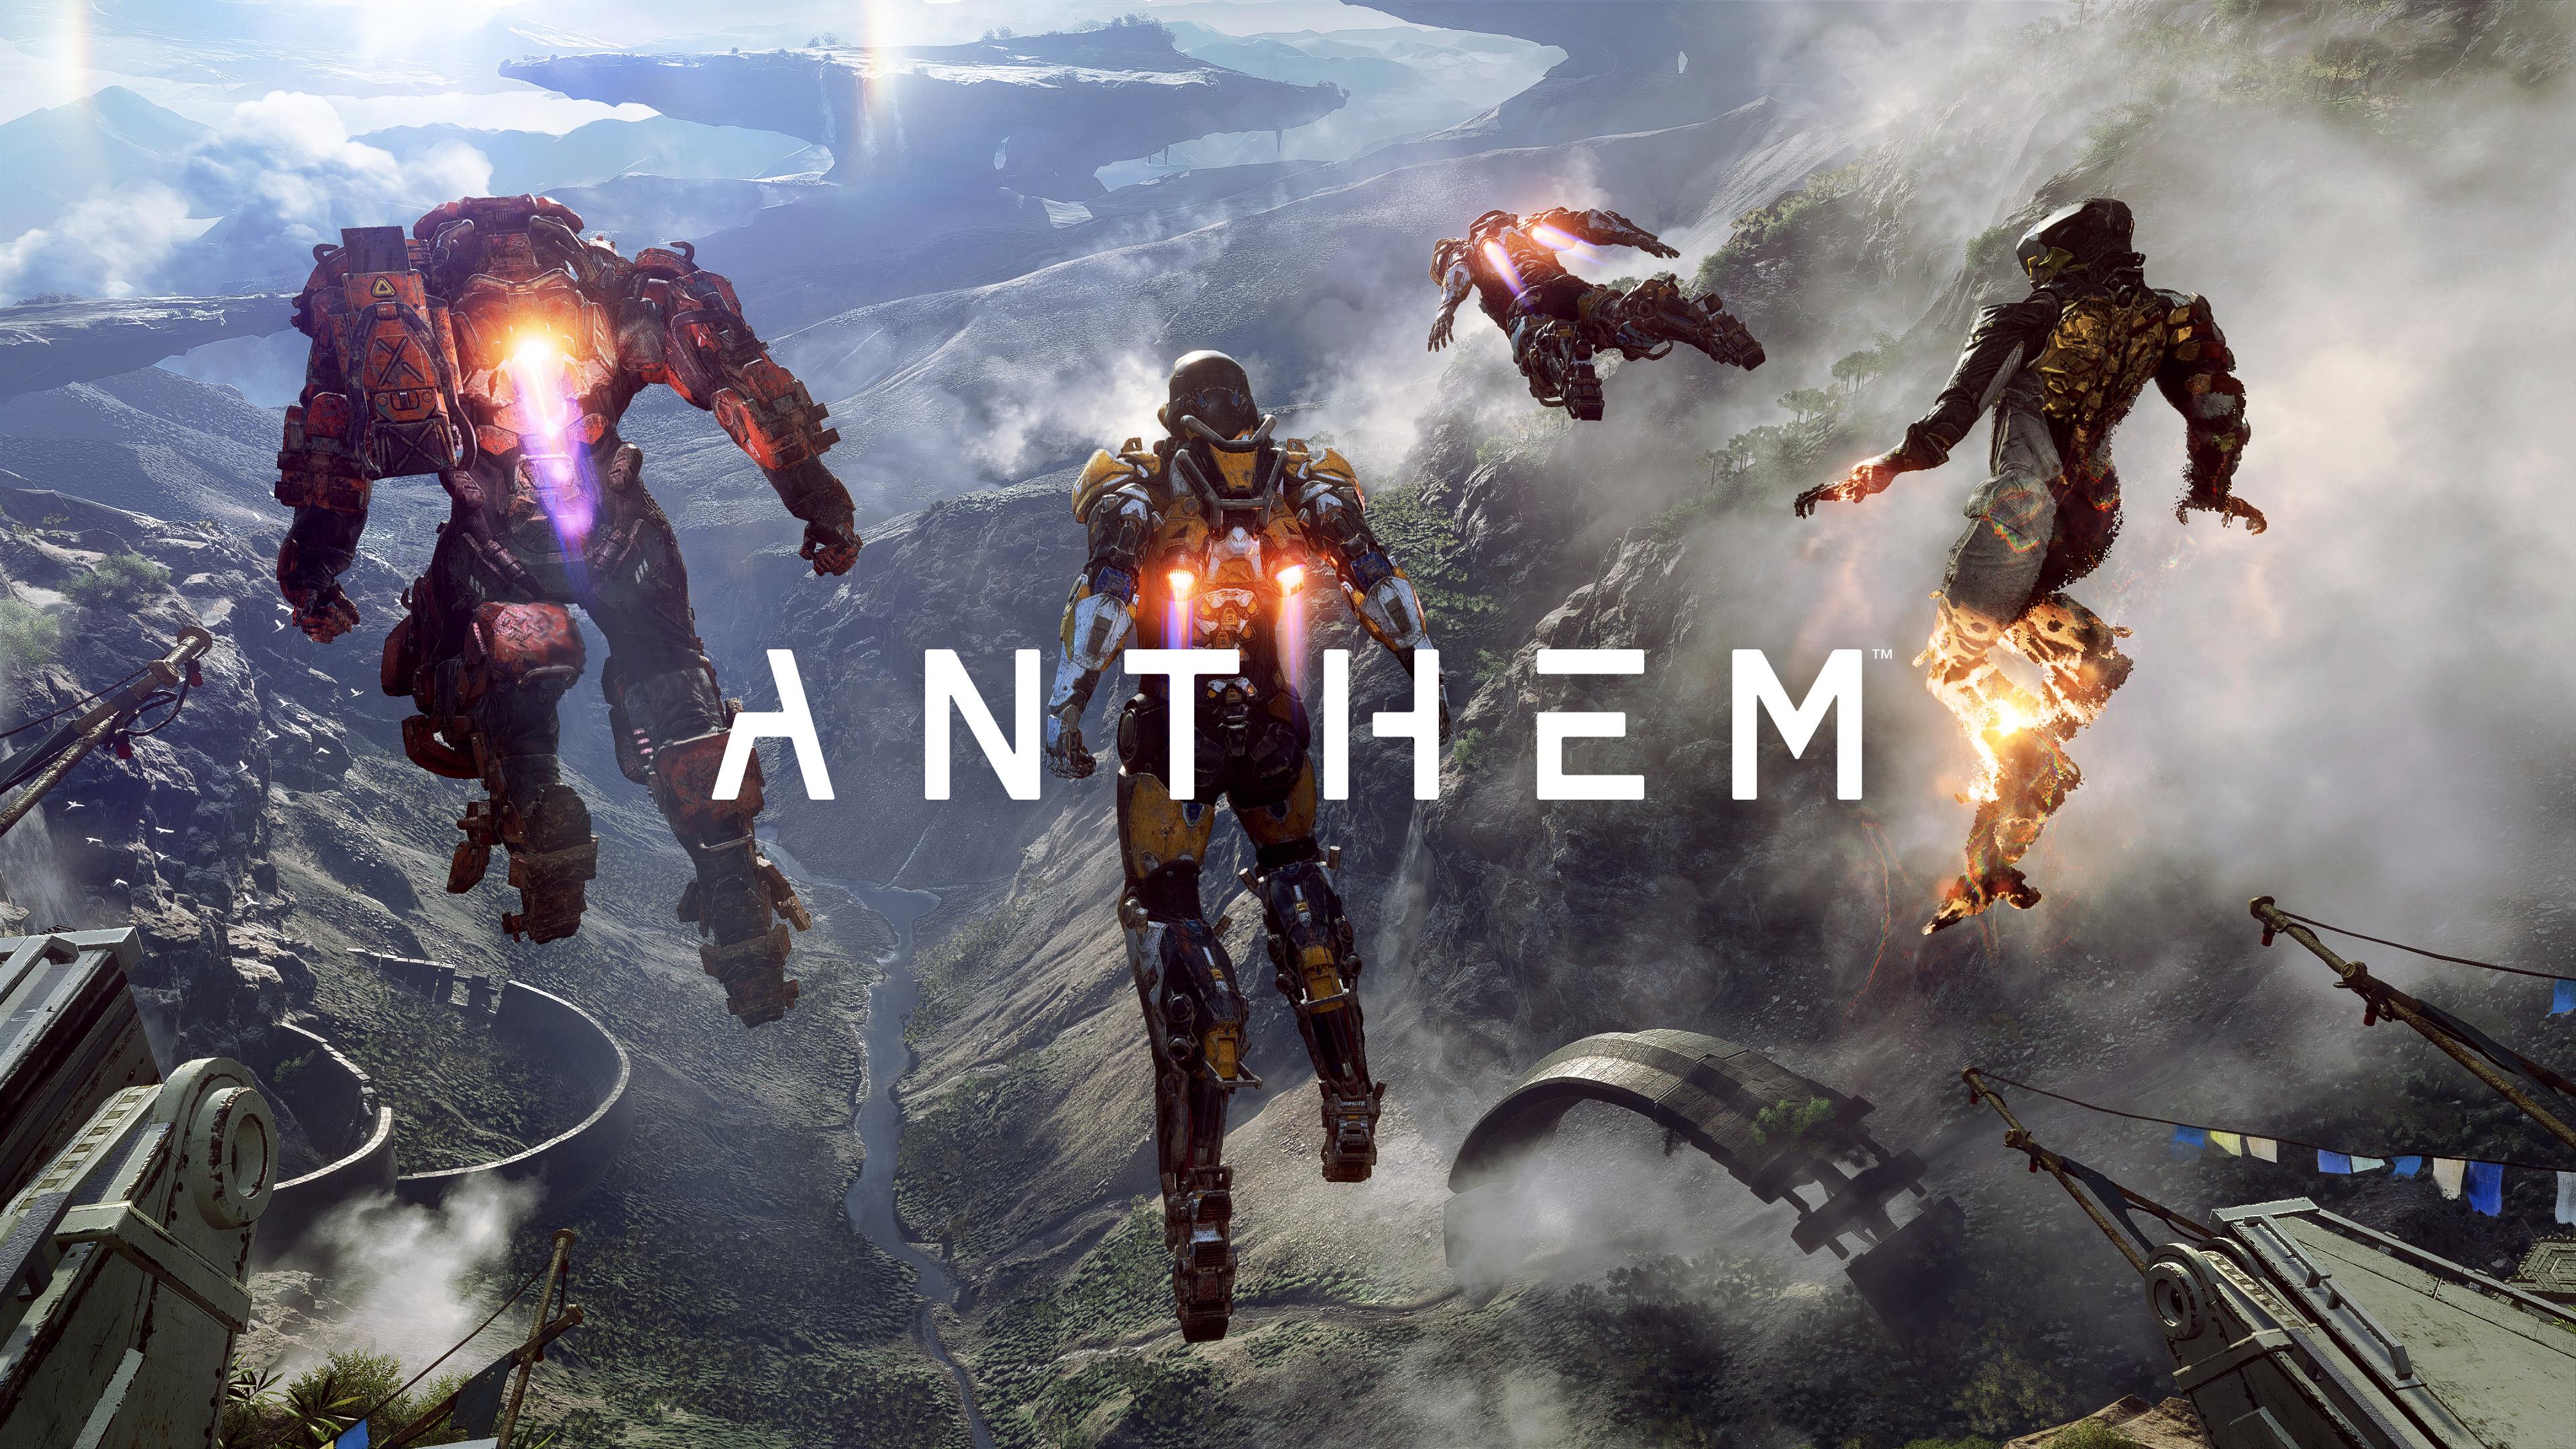 anthem games hd 4k wallpapers